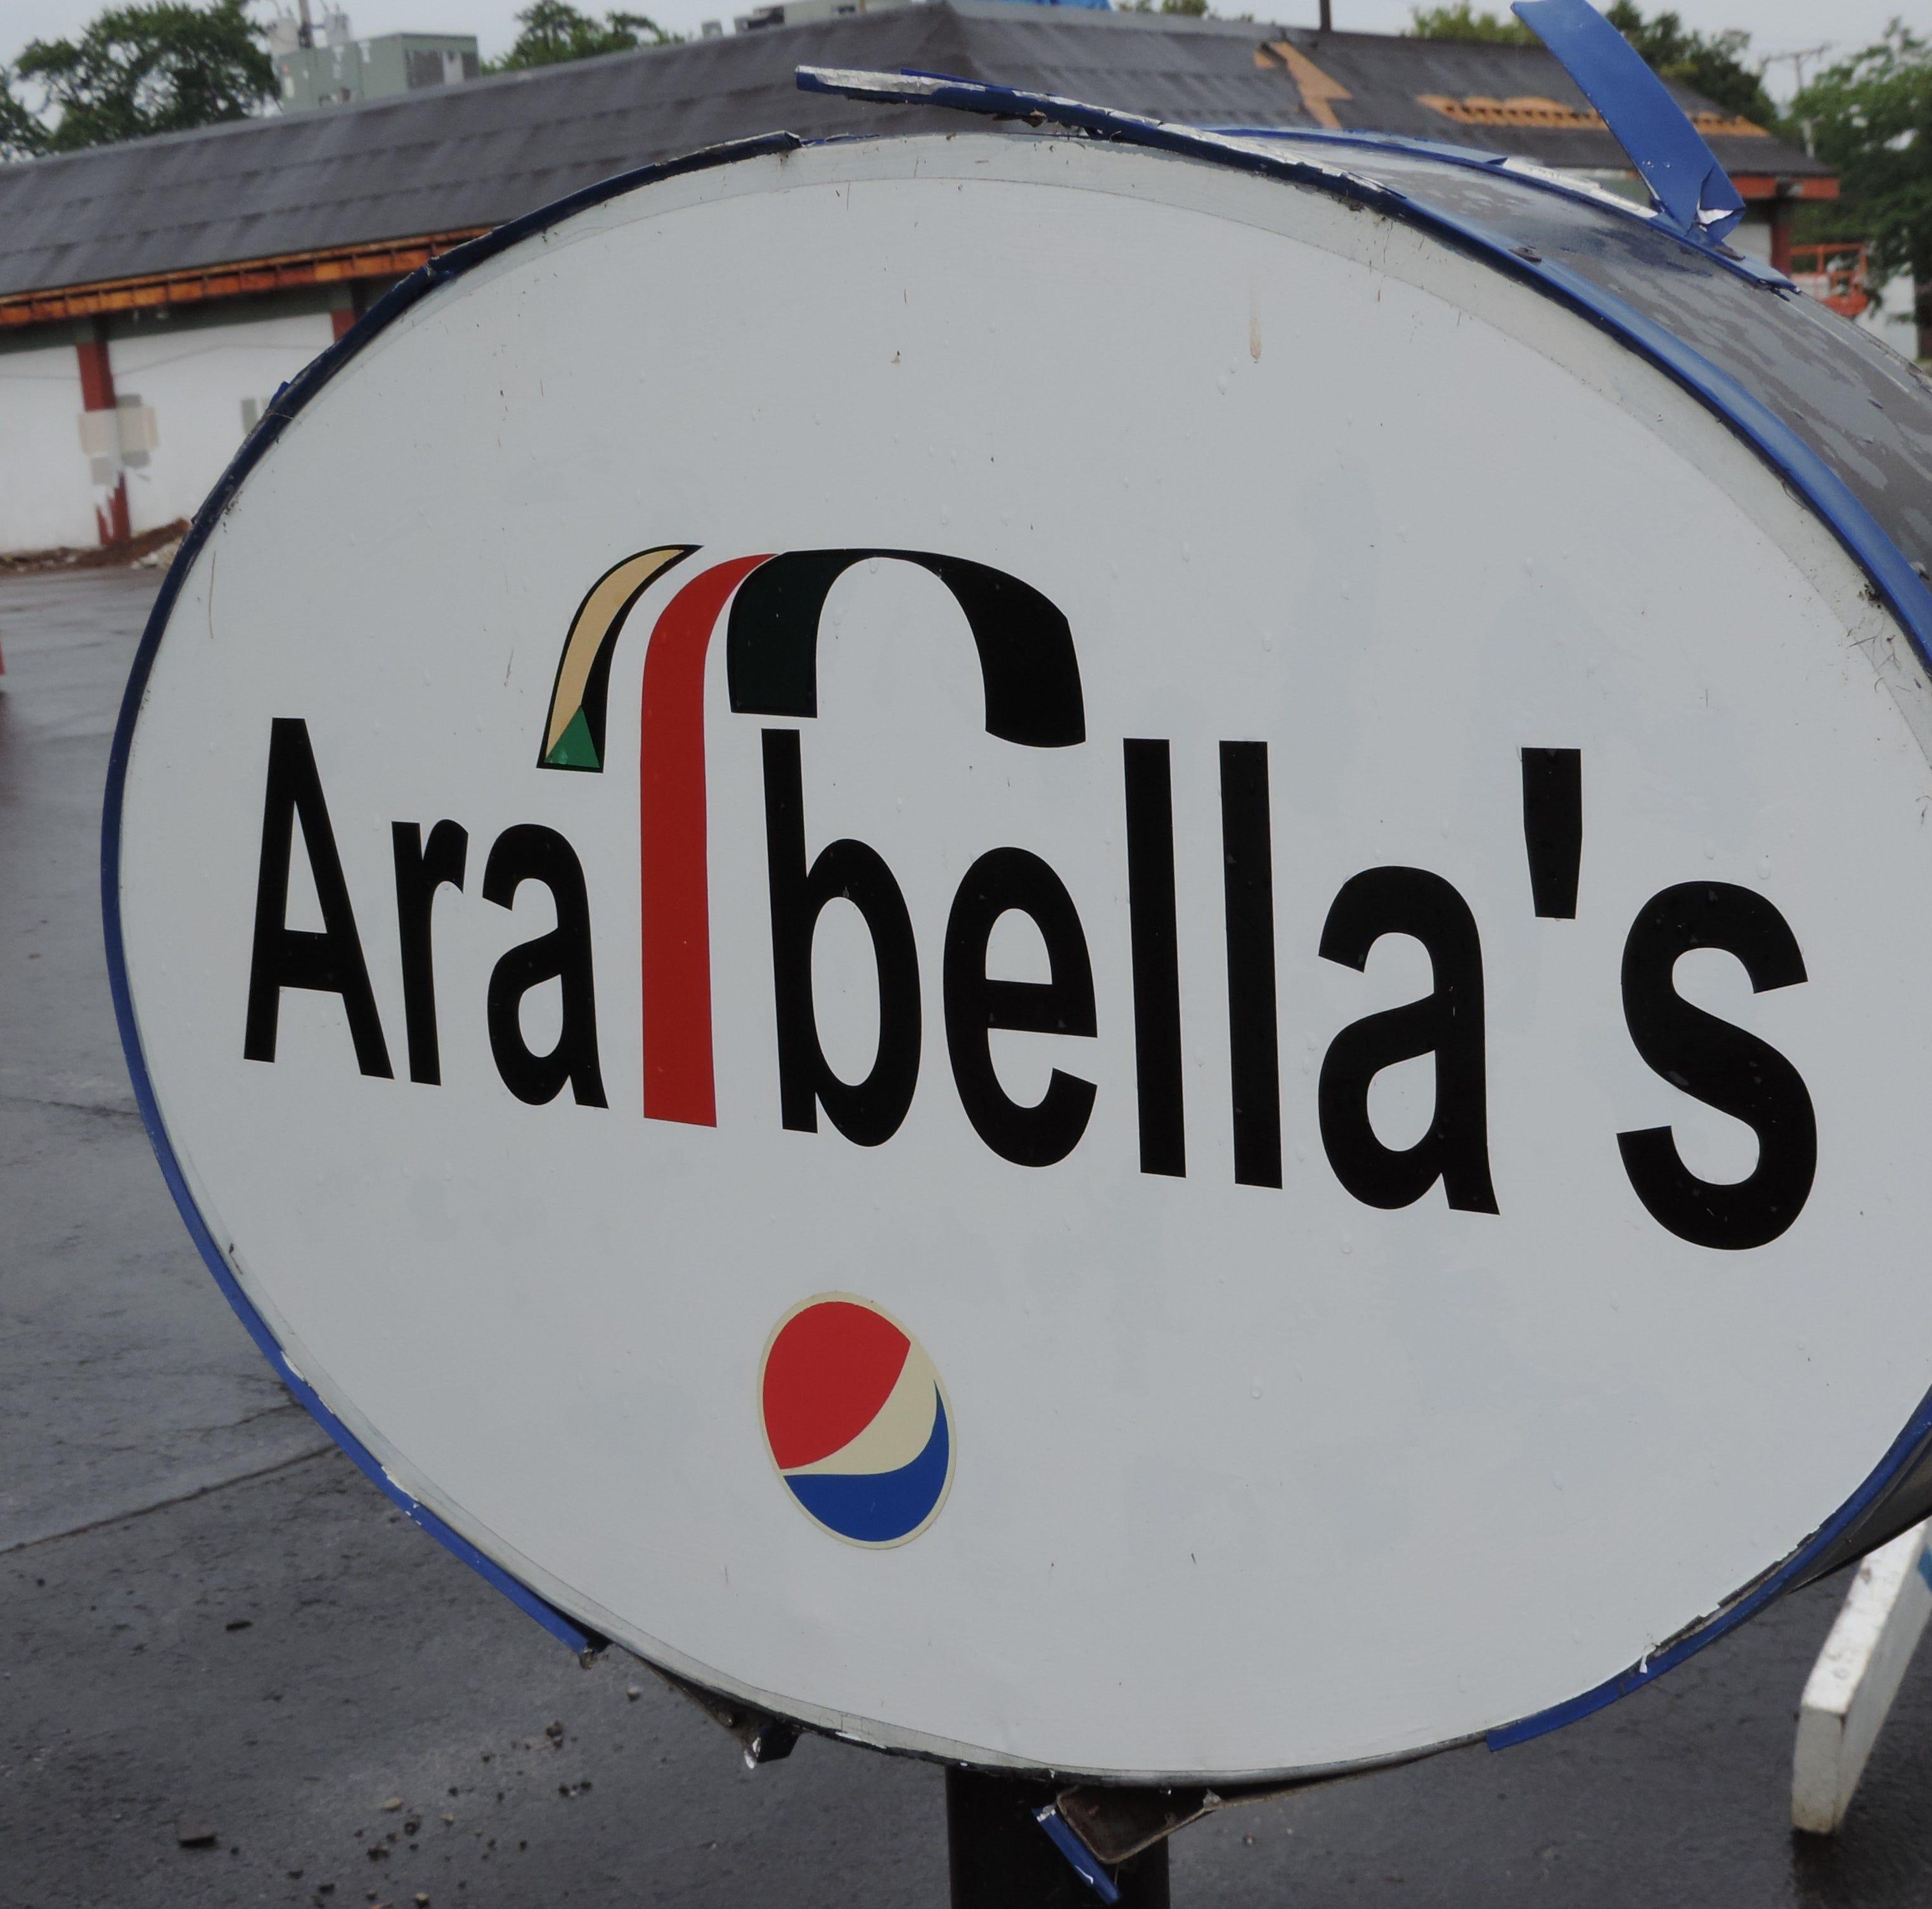 Arabella's Family Restaurant reopening as Café Bella in Sheboygan| Streetwise